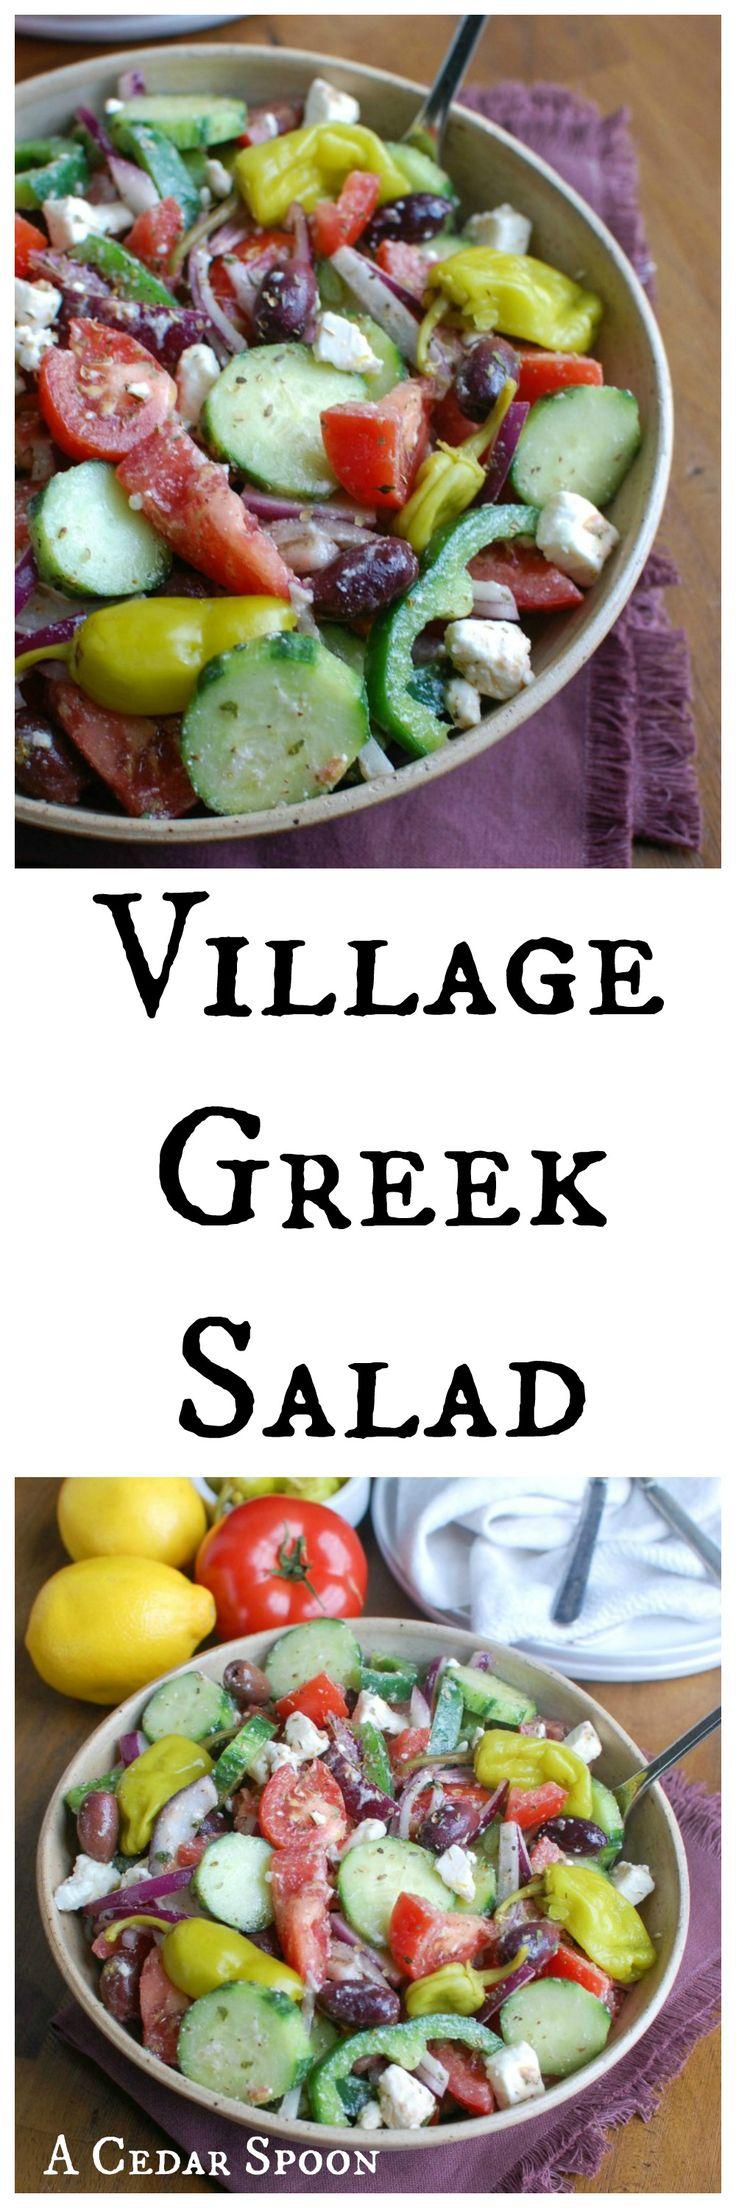 Village Greek Salad - so good. (No tomatoes for me)